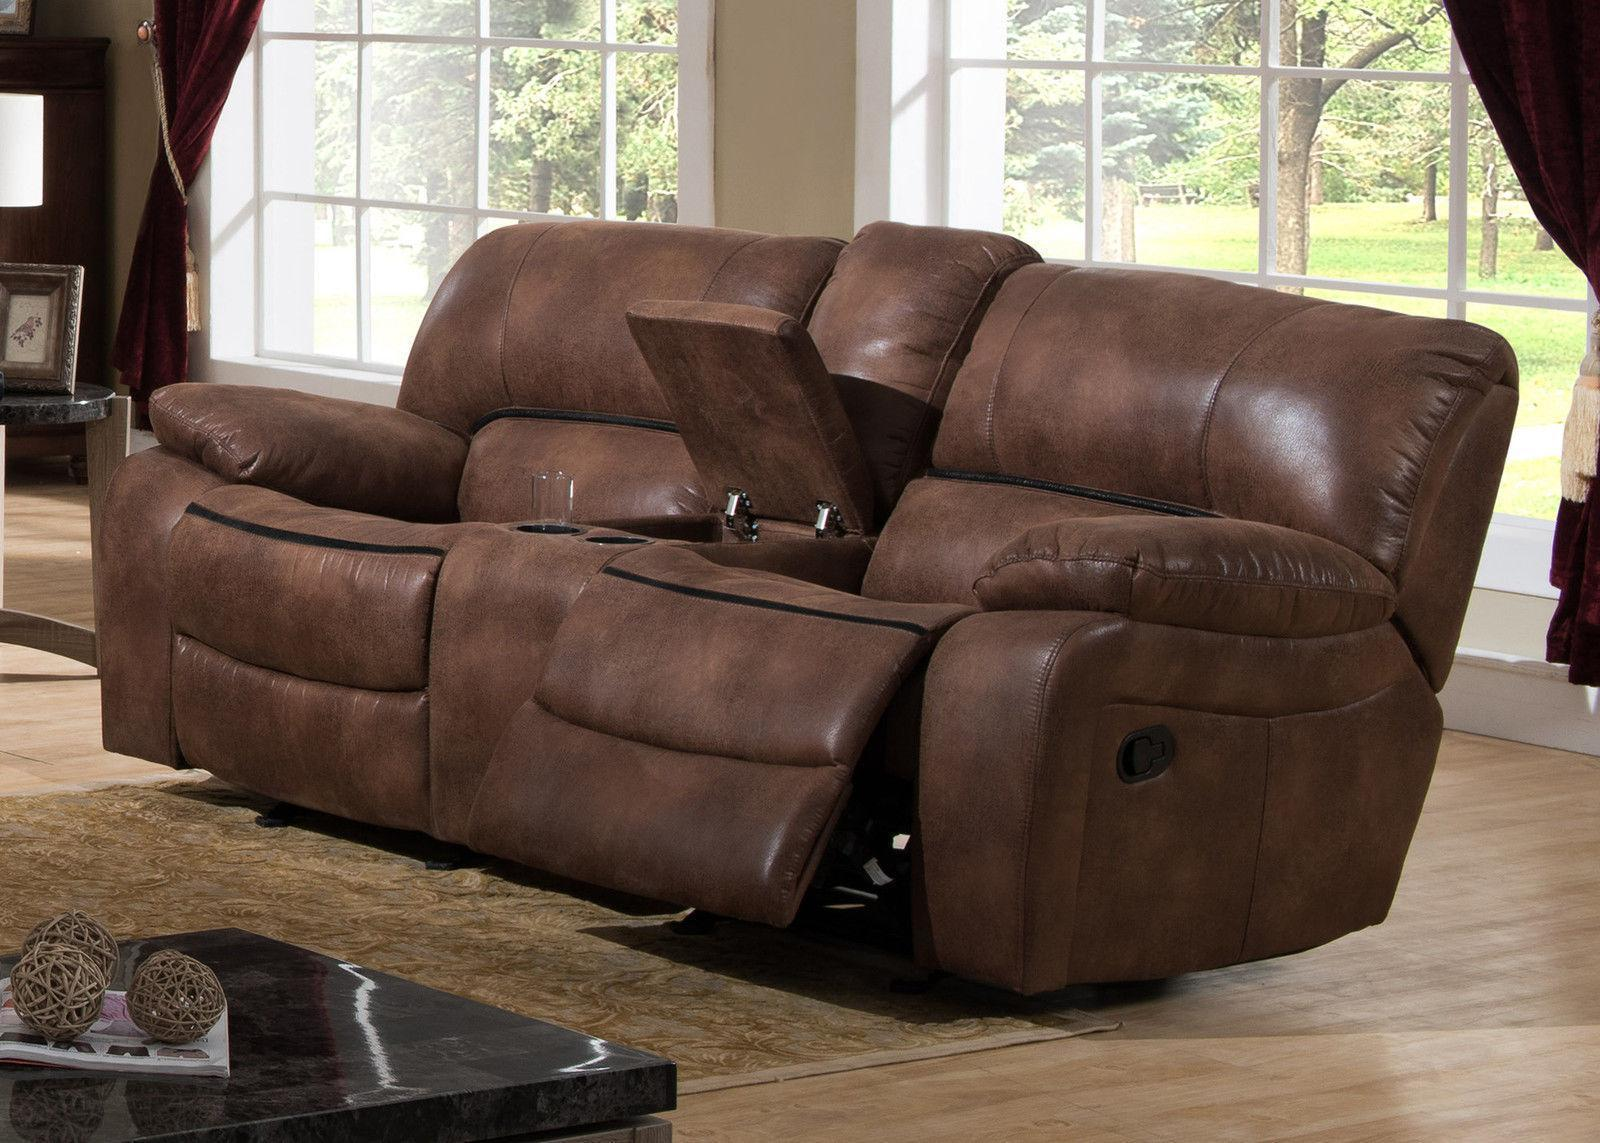 Modern brown fabric reclining living room set 3pcs ac - Fabric reclining living room sets ...